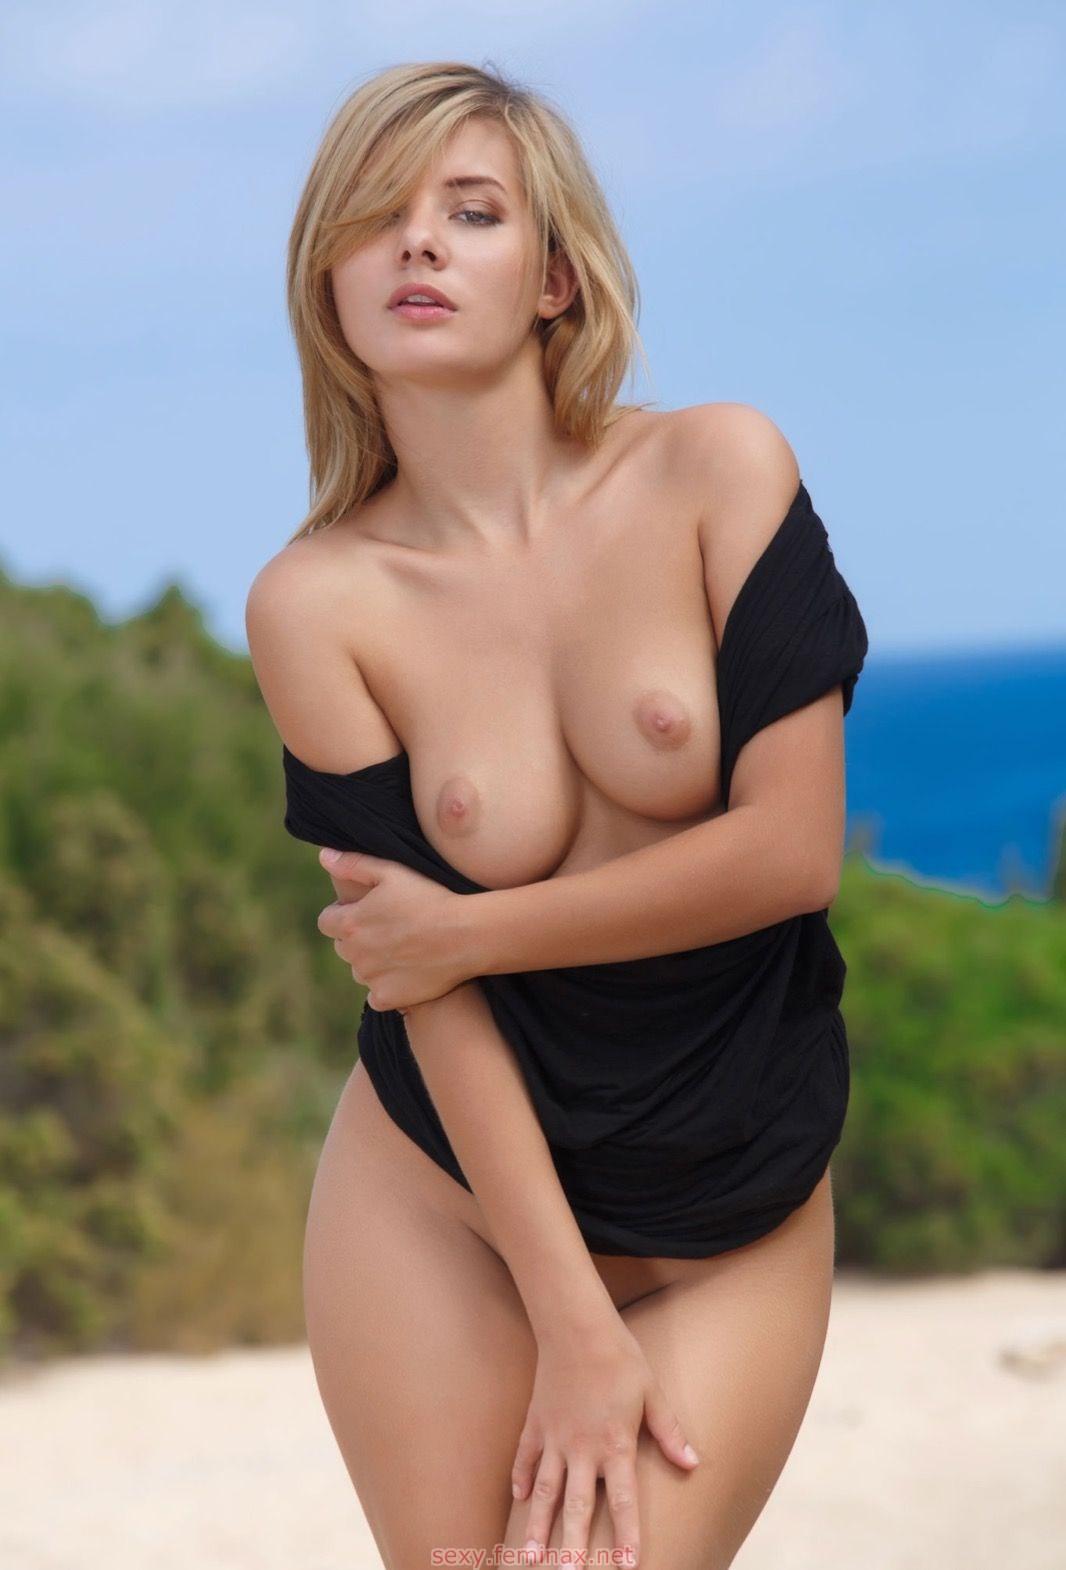 Sexygirledwige-Goaheadtouchit12Pics  Feminax -5162